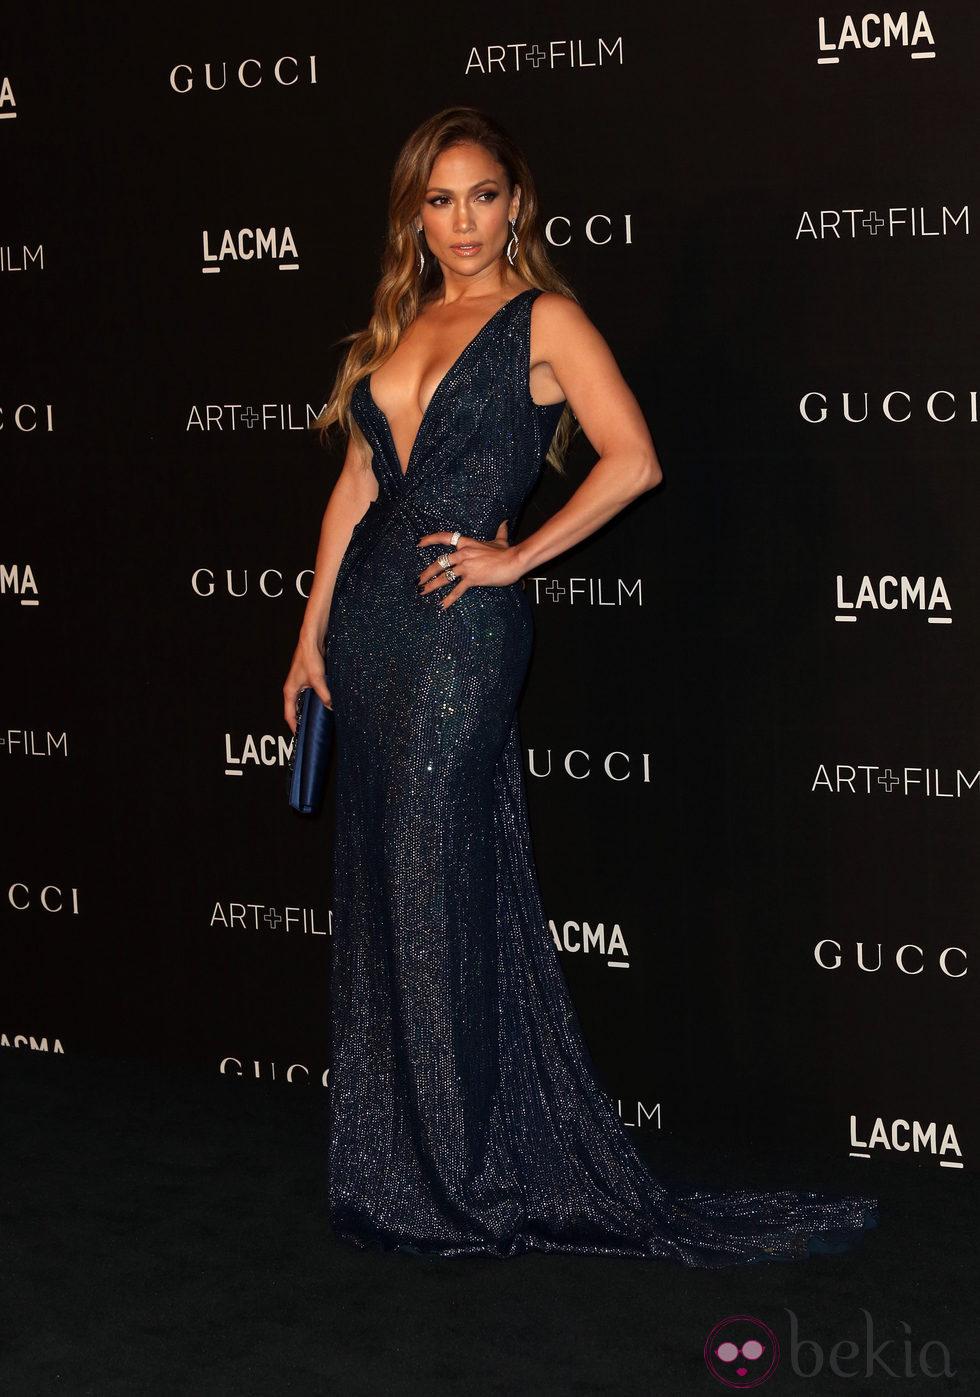 Jennifer Lopez en la gala LACMA Art + FIlm 2014